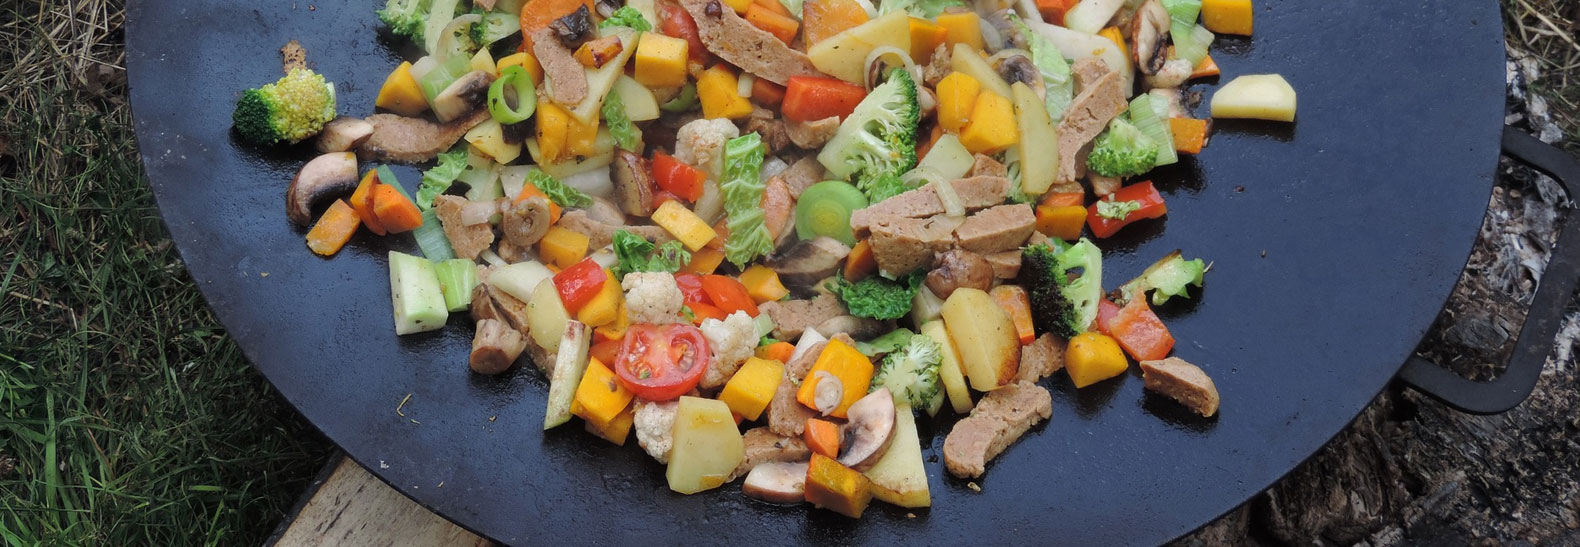 i secondi di un menu vegetariano nozze